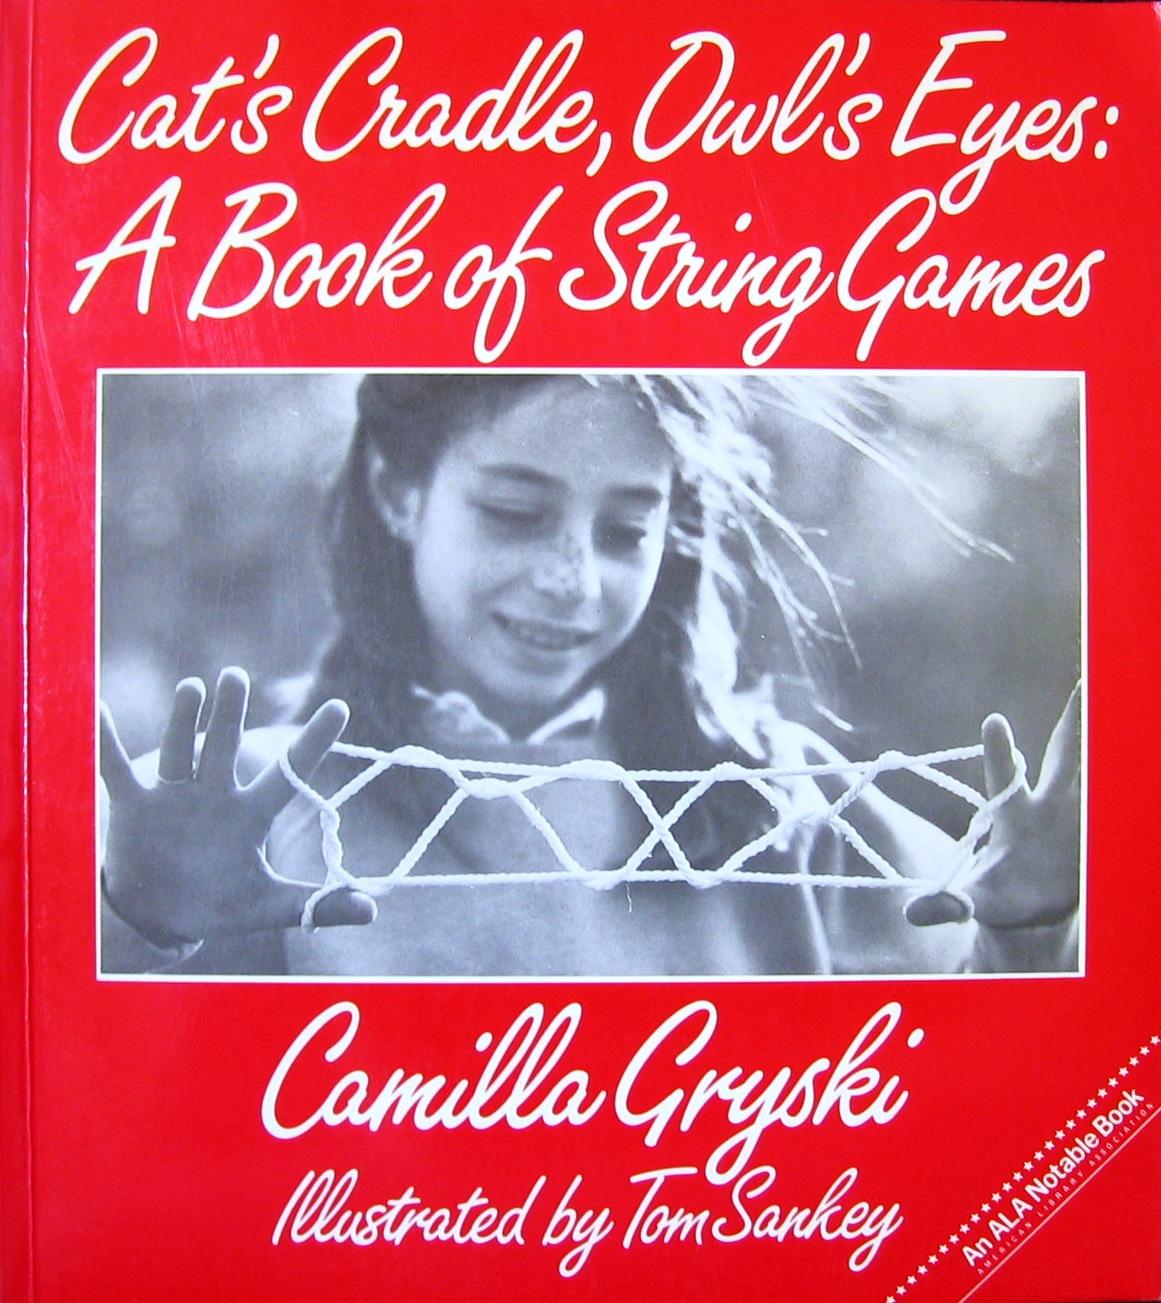 Cat's cradle, owl's eyes